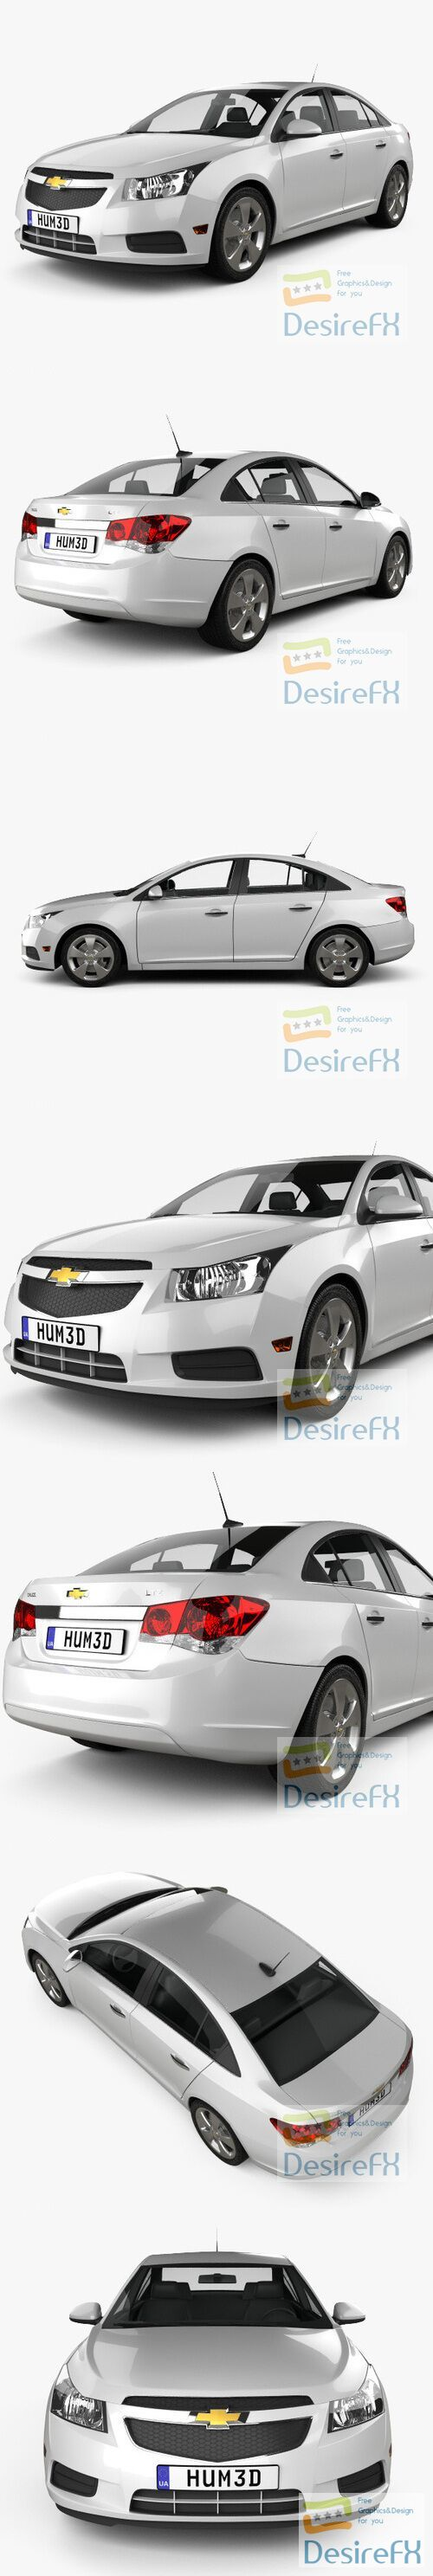 Chevrolet Cruze 2011 3D Model